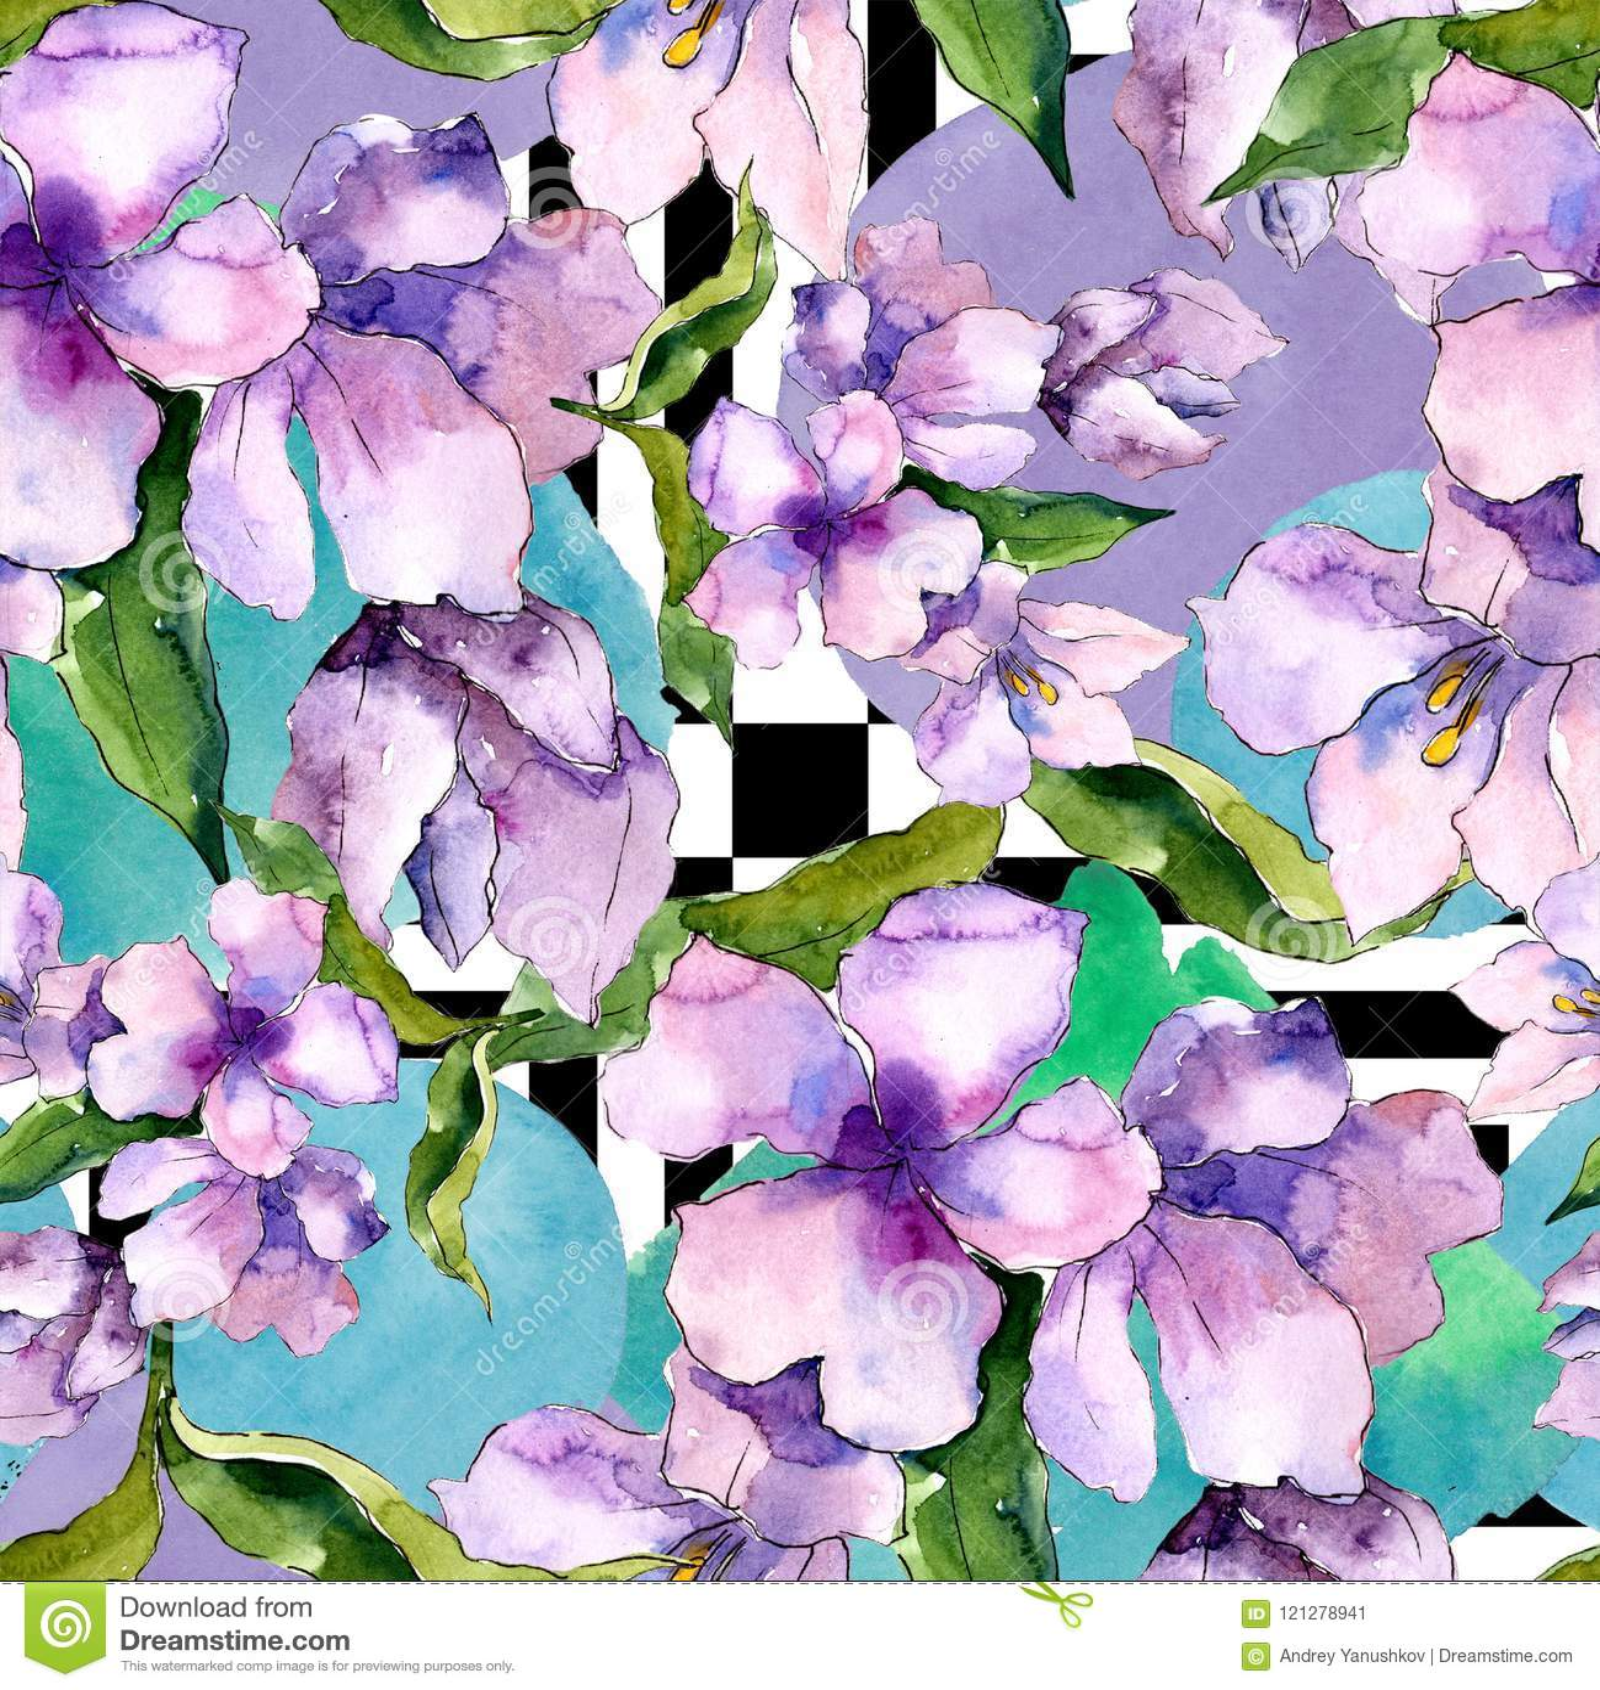 Purple and blue alstroemeria flowers floral botanical flower download purple and blue alstroemeria flowers floral botanical flower seamless background pattern stock izmirmasajfo